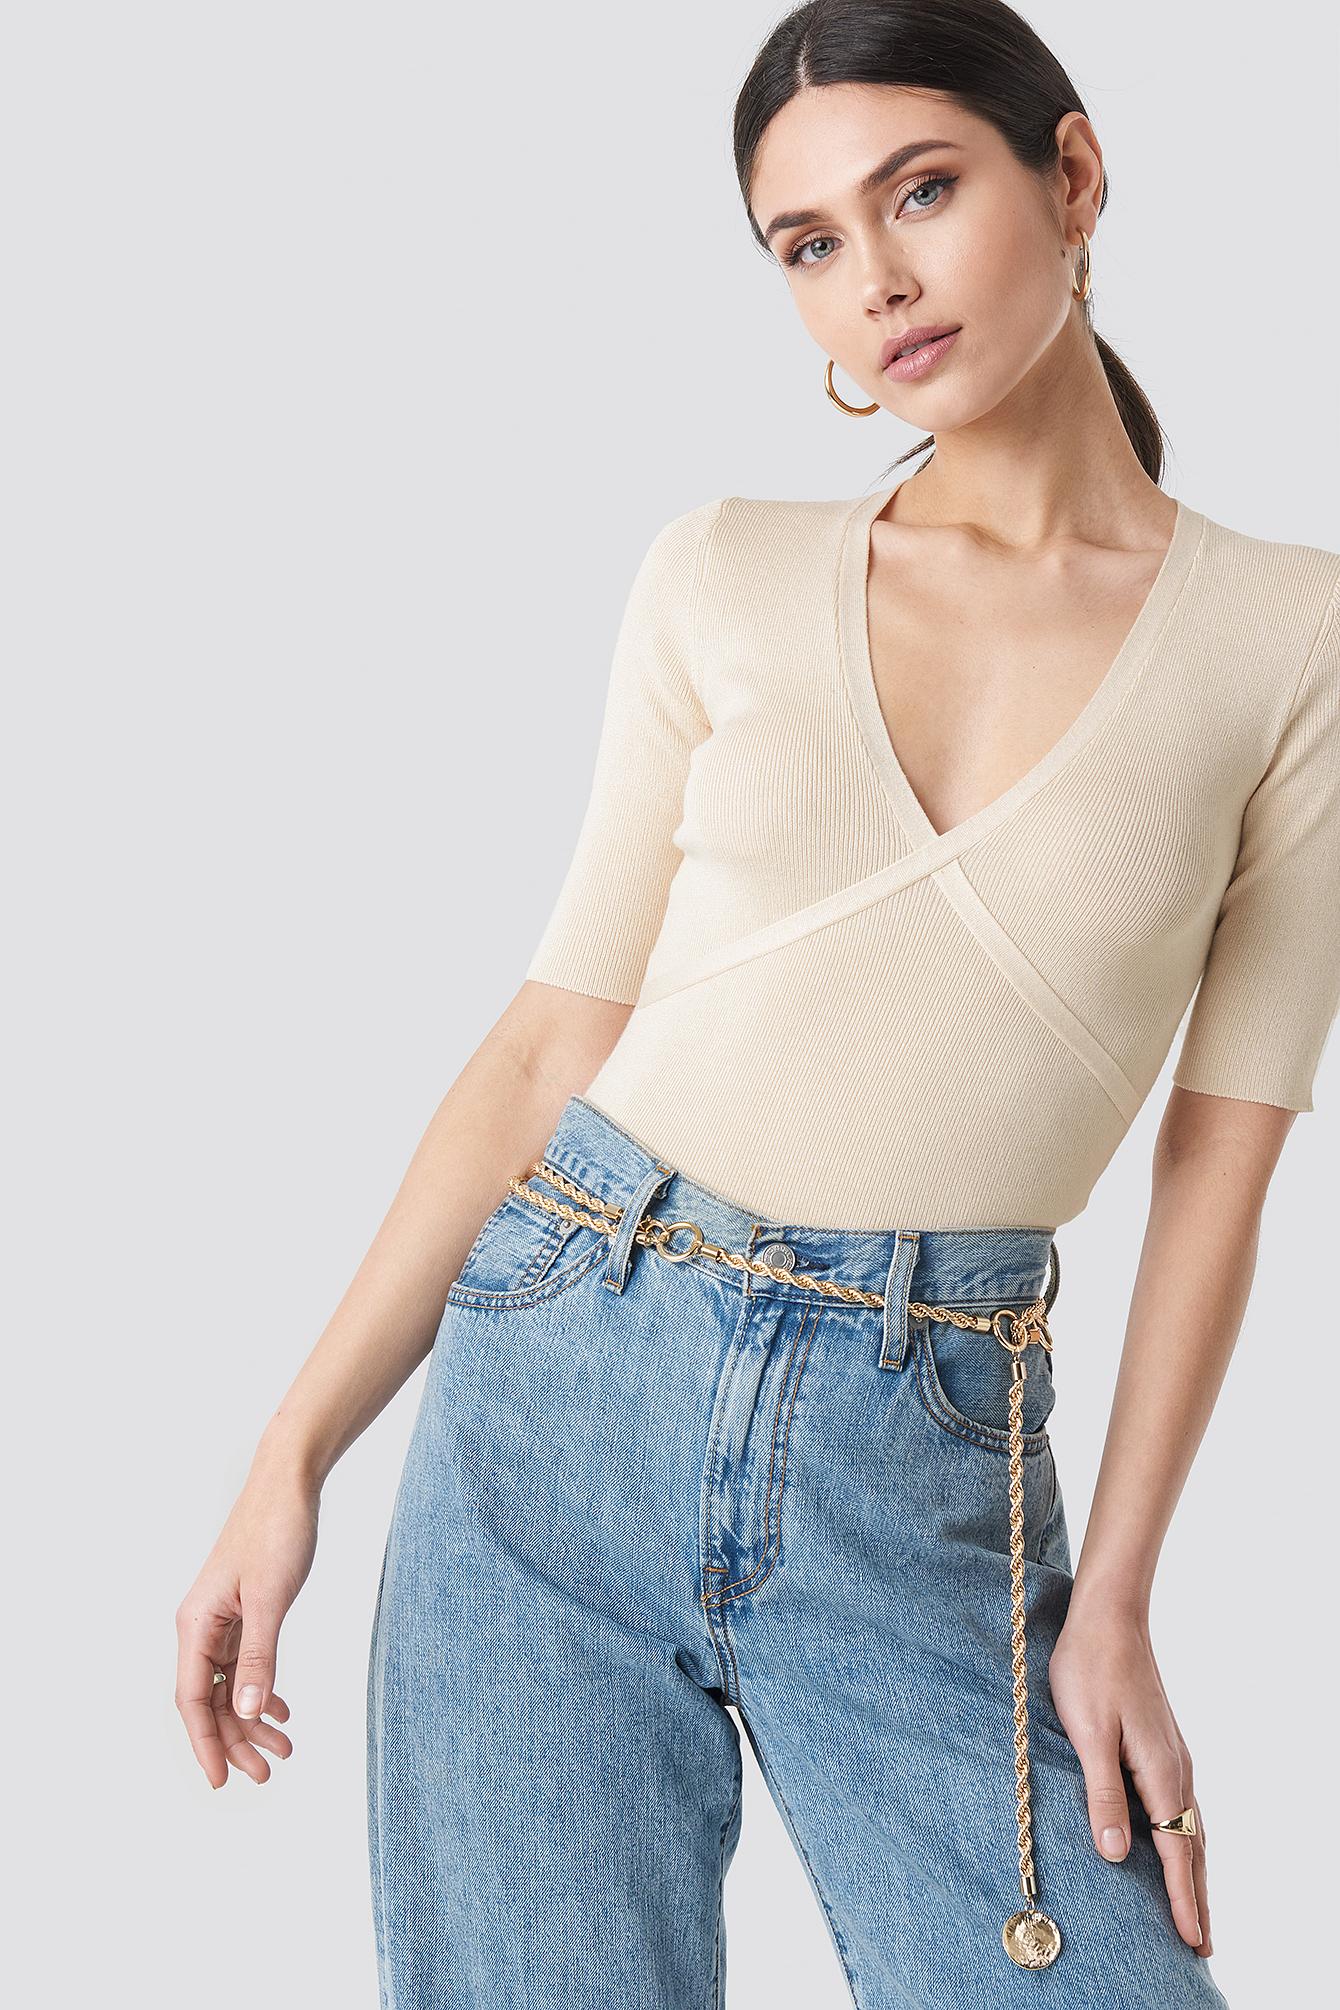 NA-KD Trend Marked Bust Line Sweater - Beige